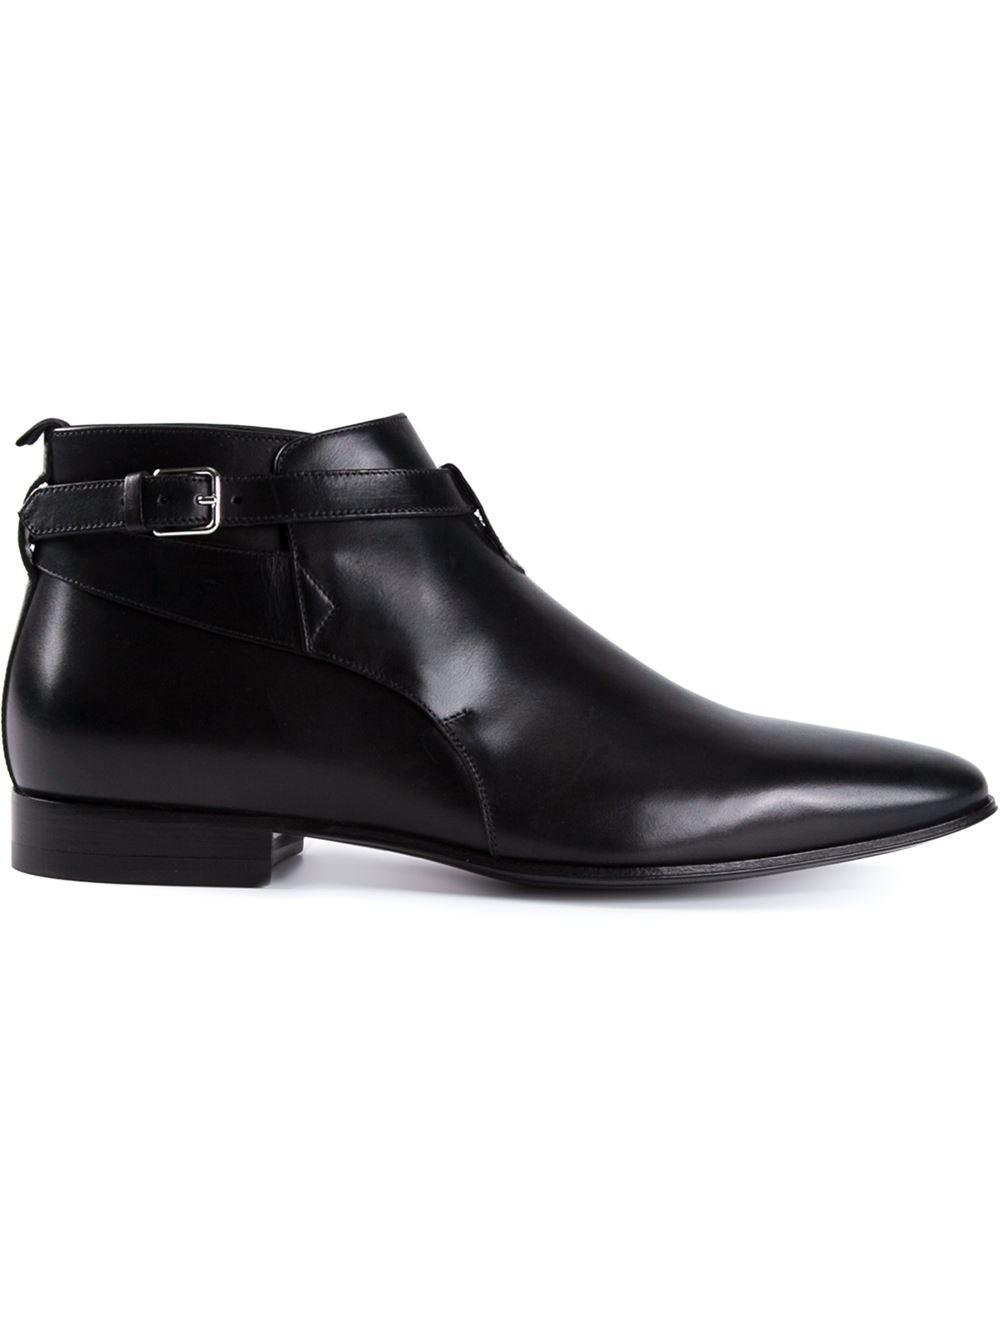 Lyst Saint Laurent Leather Boots In Black